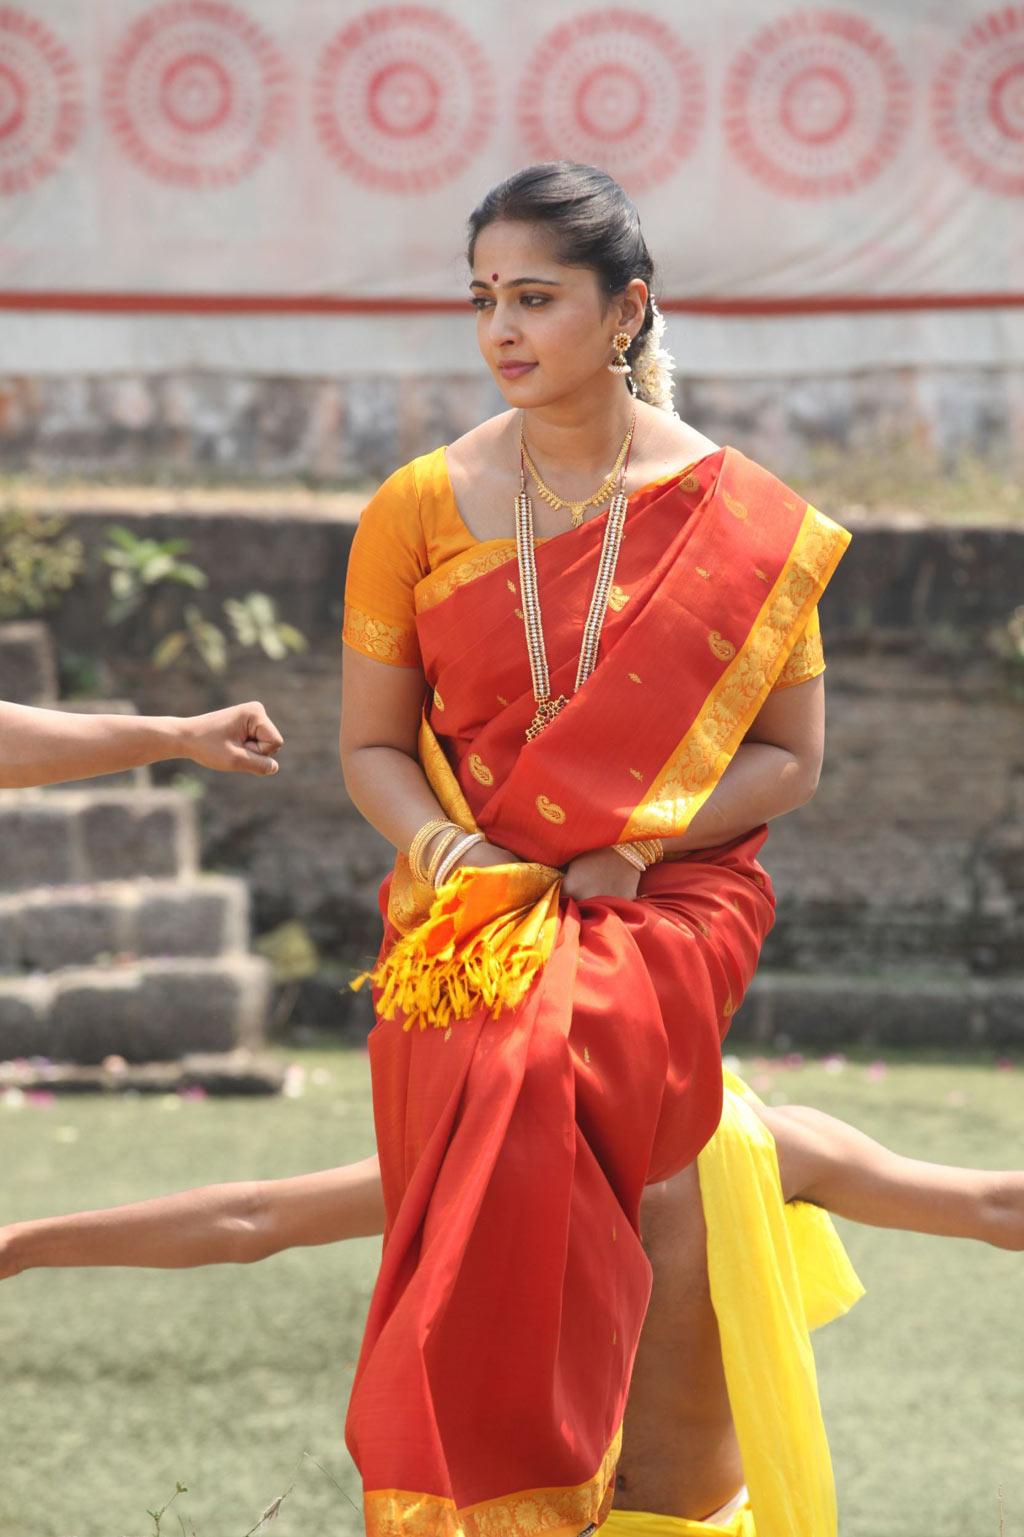 South Indian Girl Anushka Shetty Long Hair Stills In Orange Traditional Saree